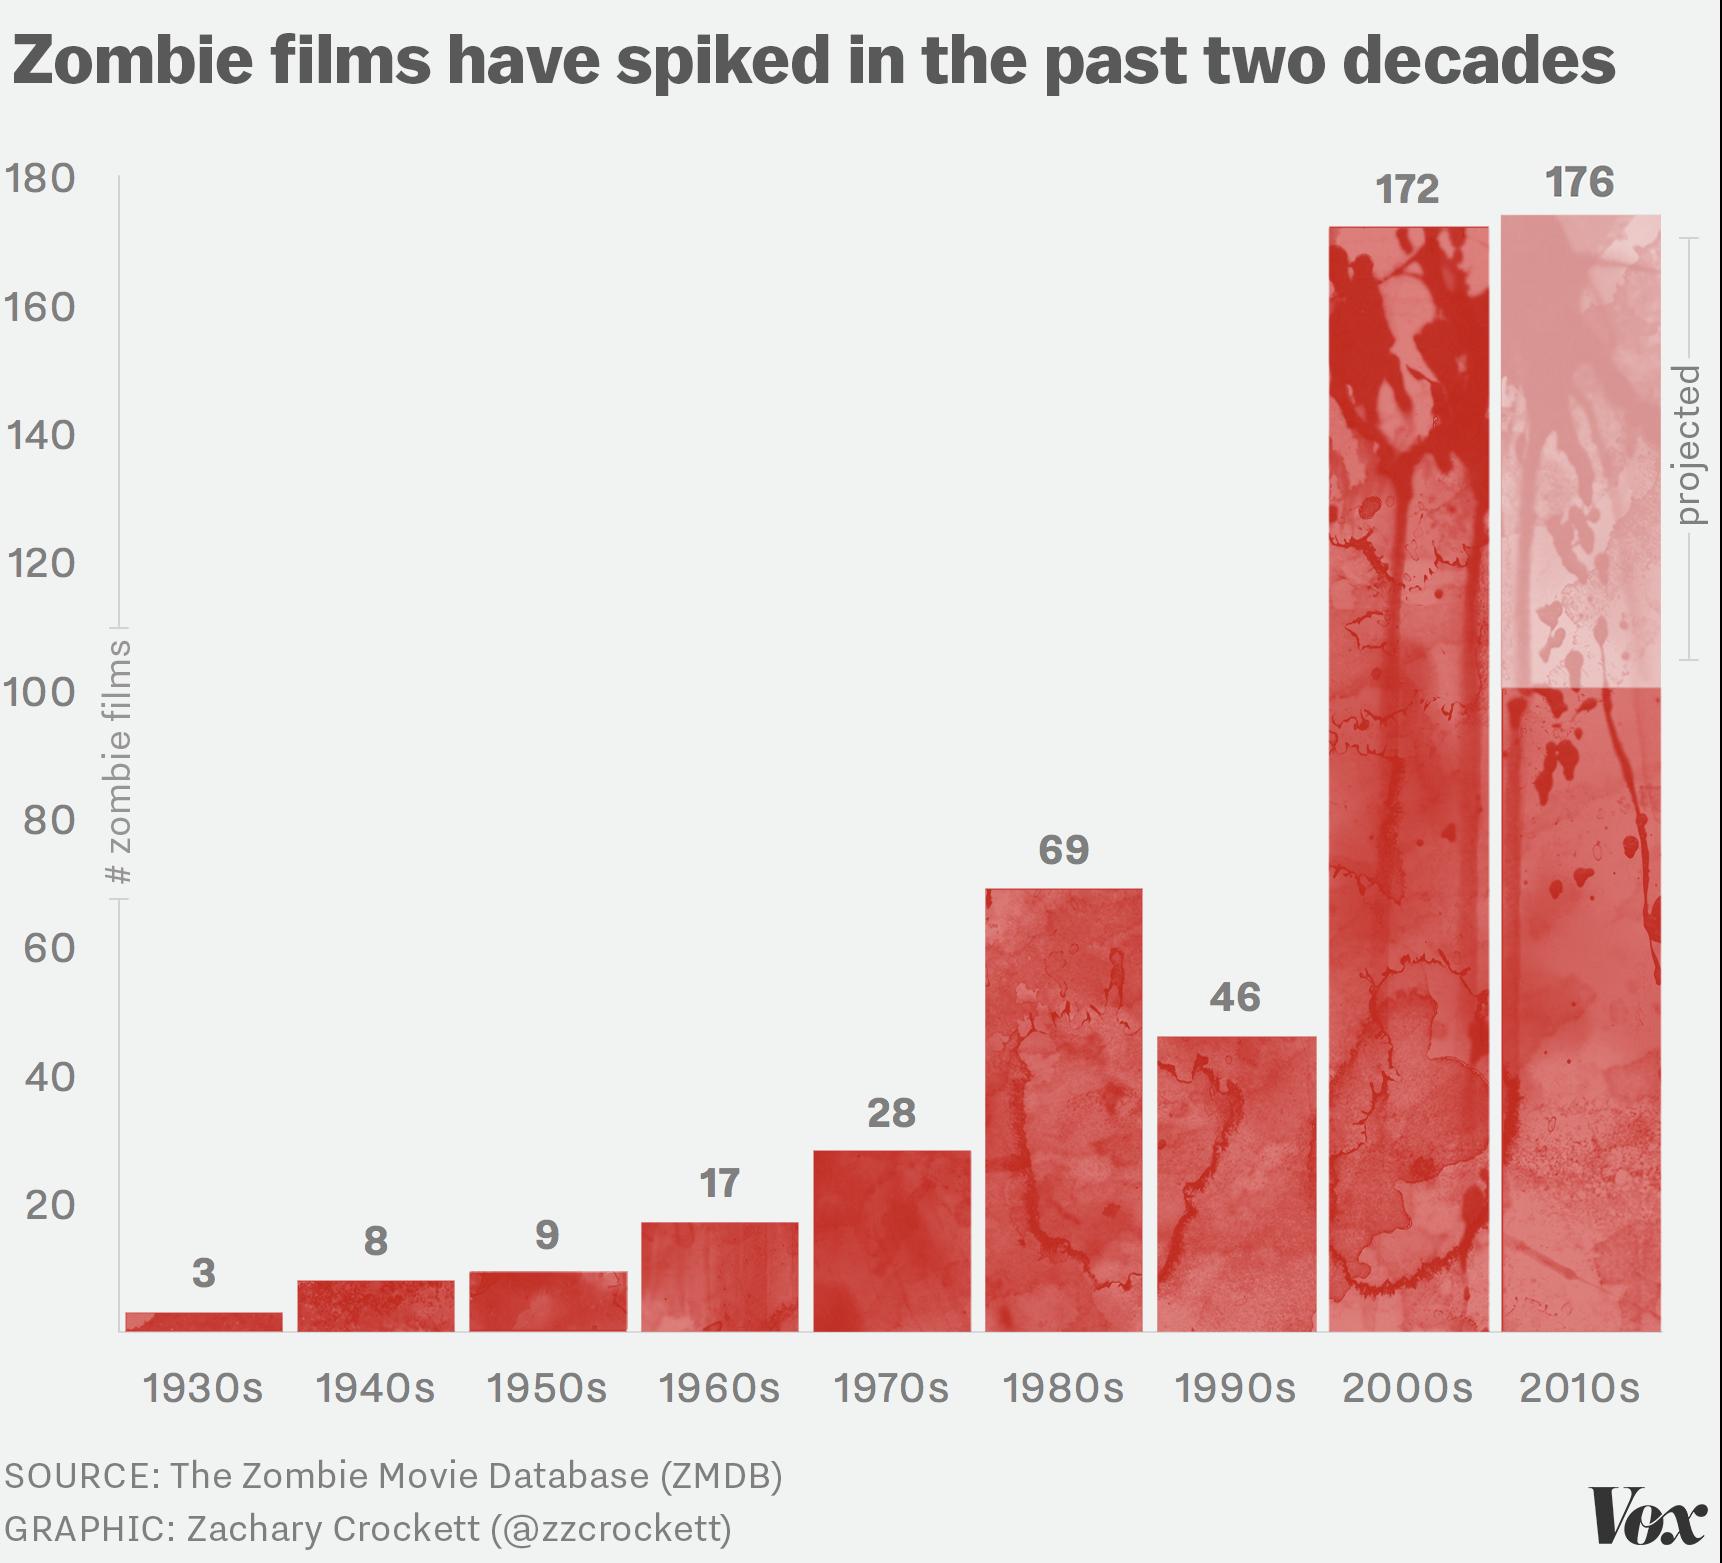 chart of zombie film popularity